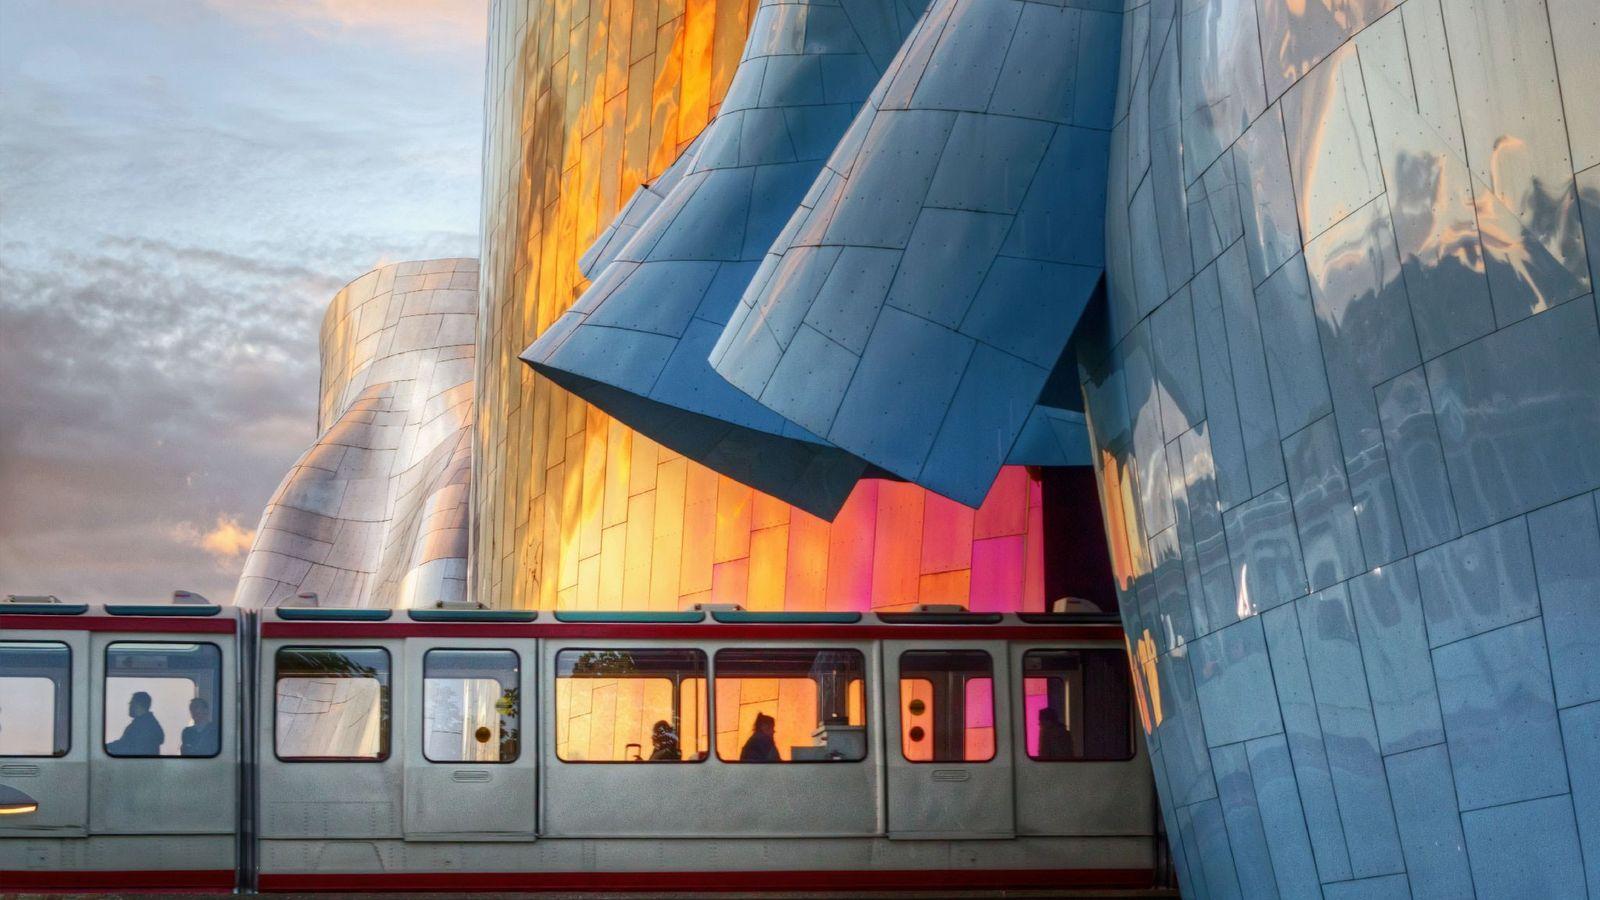 El monorail de Seattle